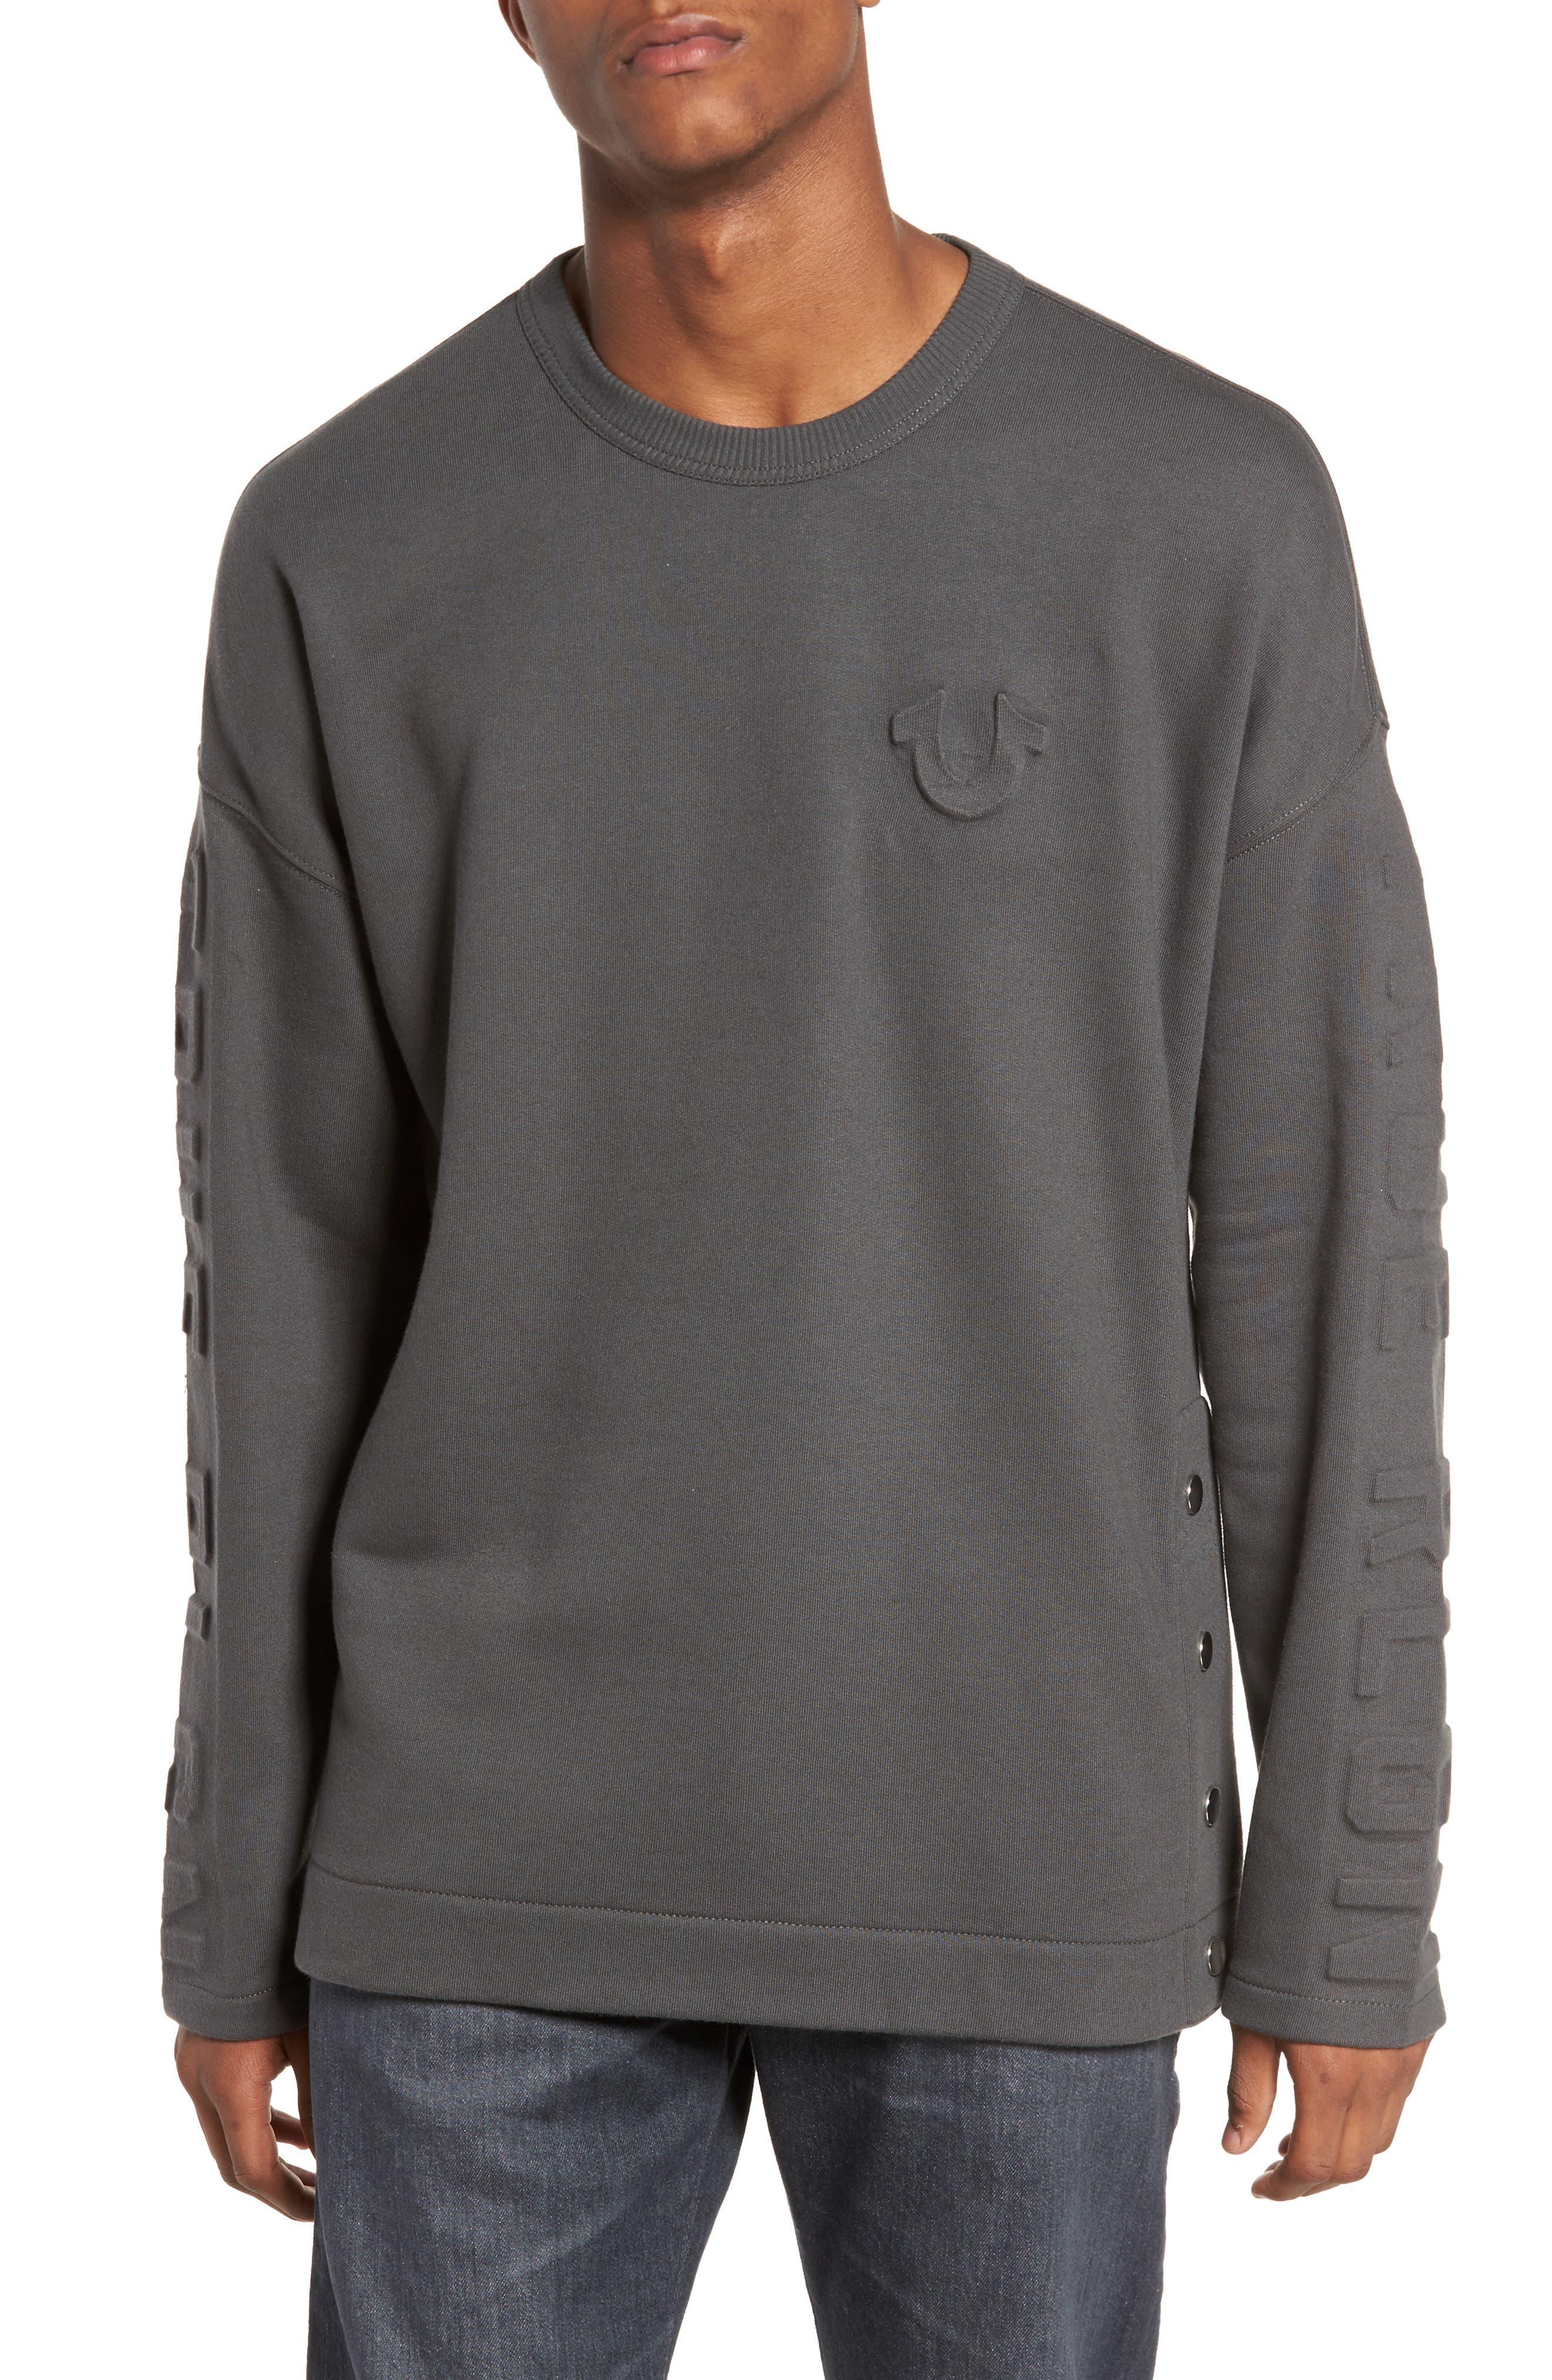 True Religion Brand Jeans Oversize Fleece Sweatshirt